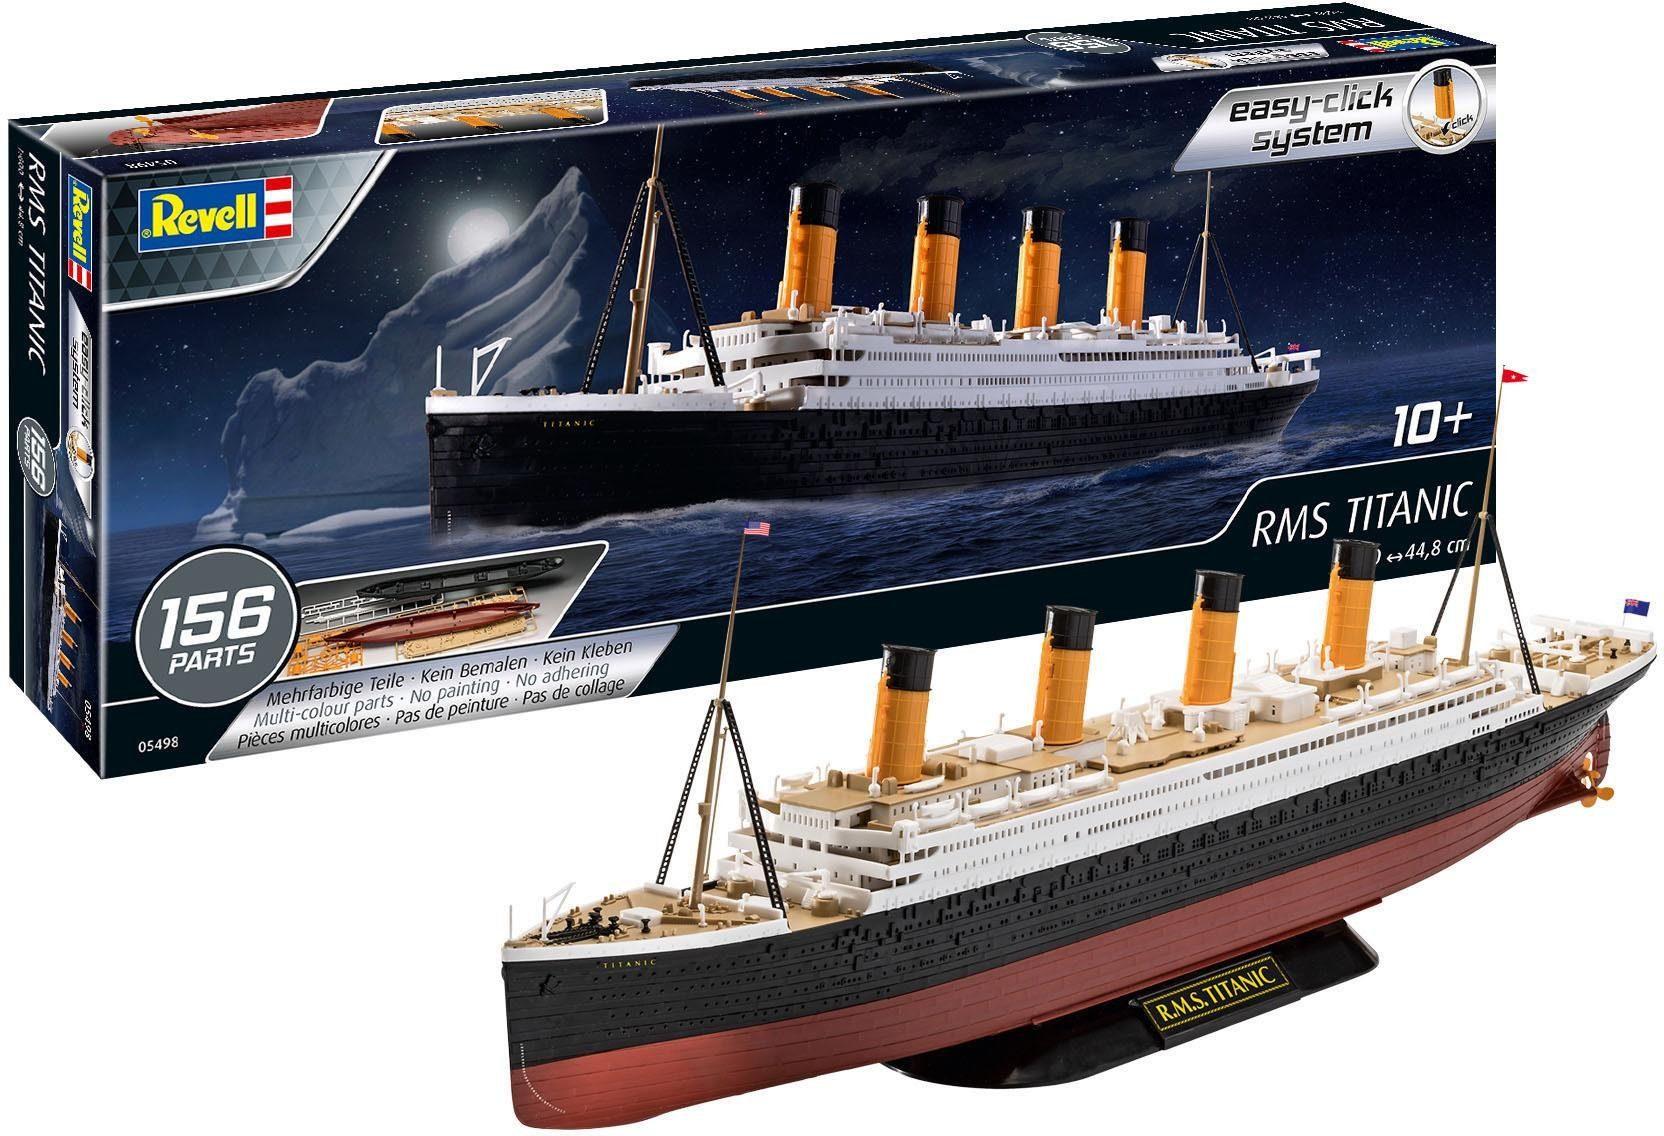 Revell Modellbausatz Schiff, Maßstab 1:600, »RMS TITANIC, easy-click-system«